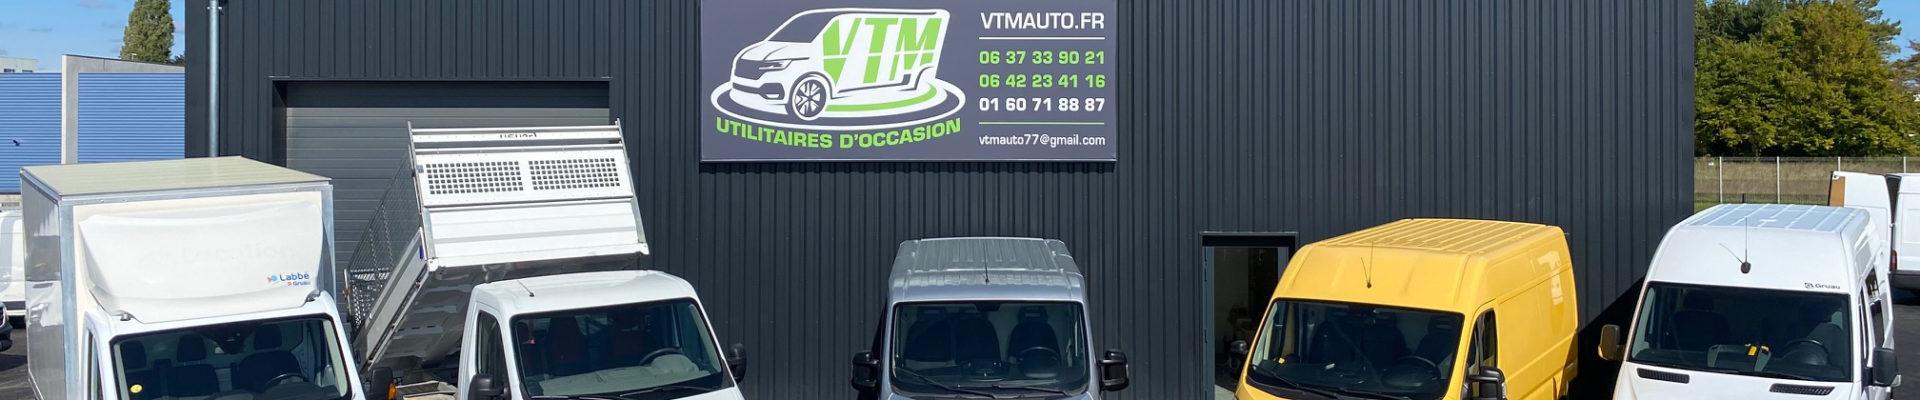 VTM AUTO